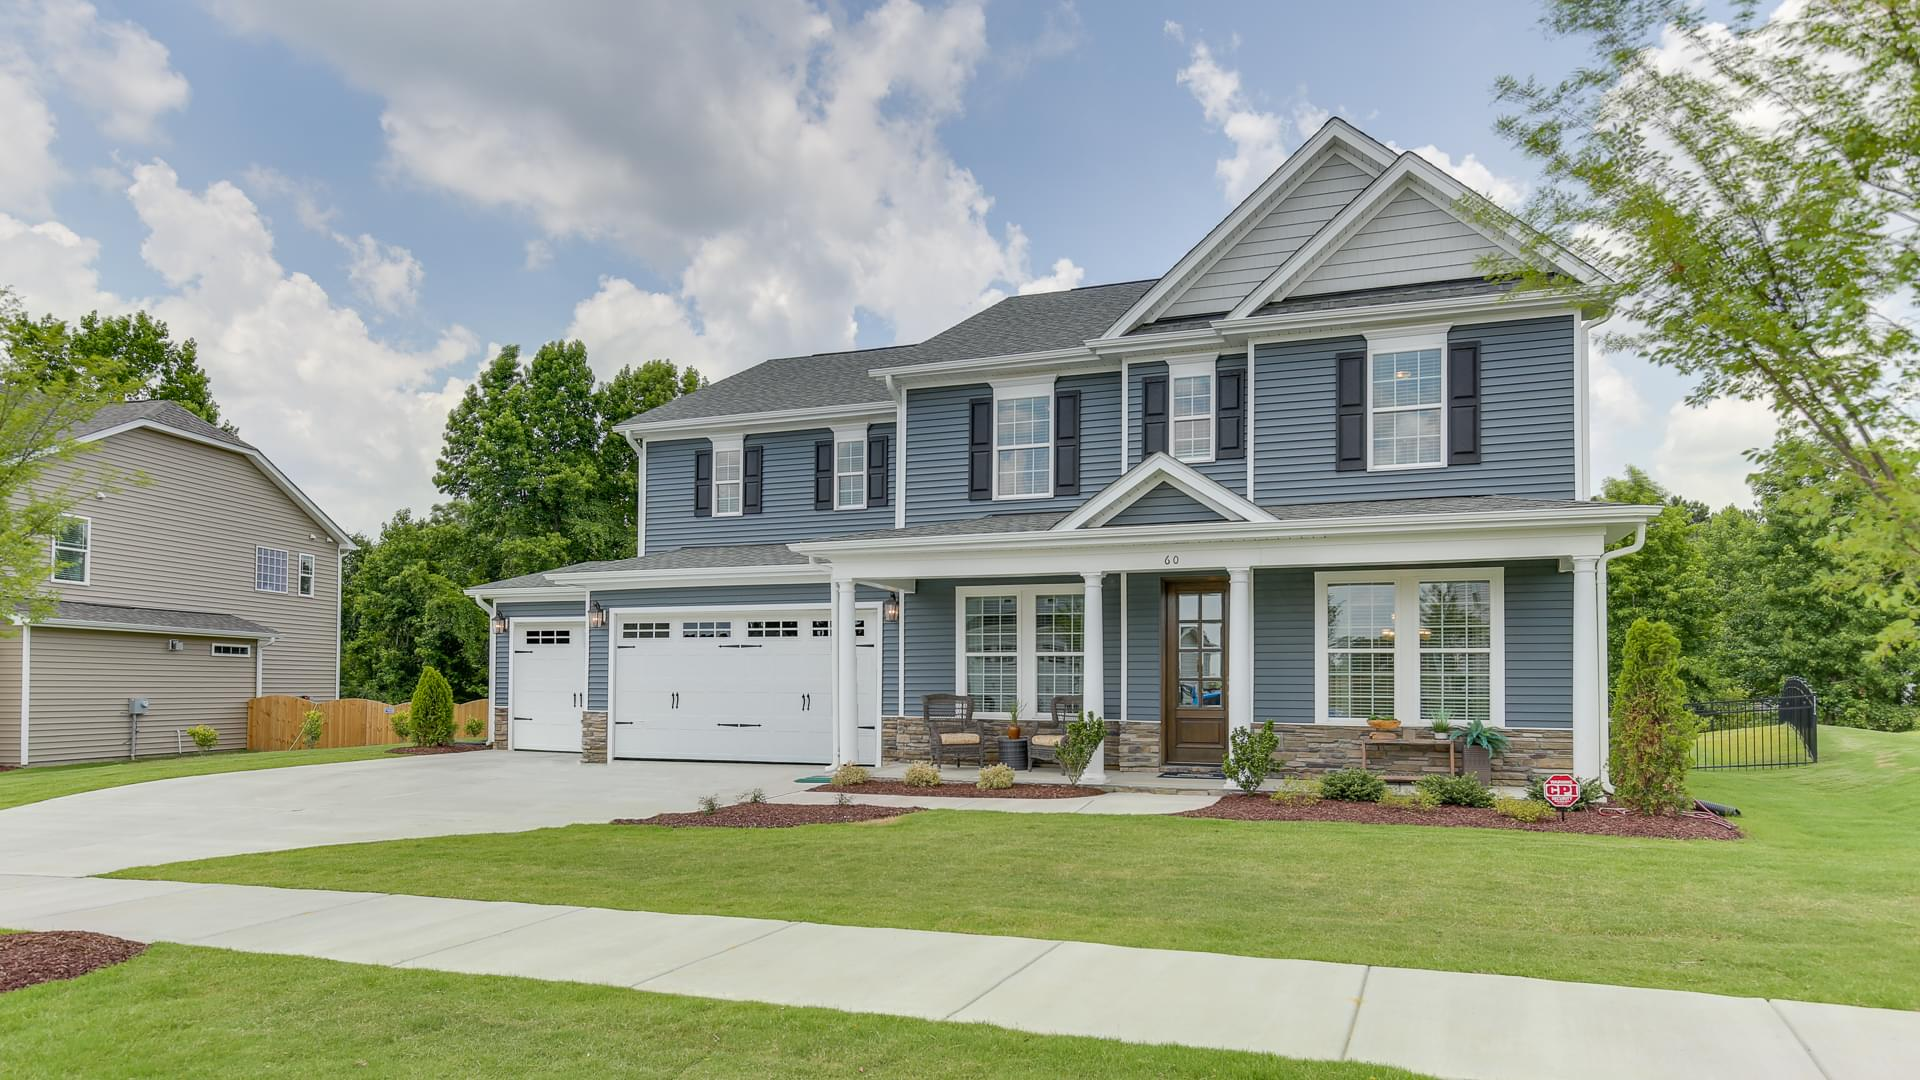 Chesapeake Homes The Harmony Elevation G